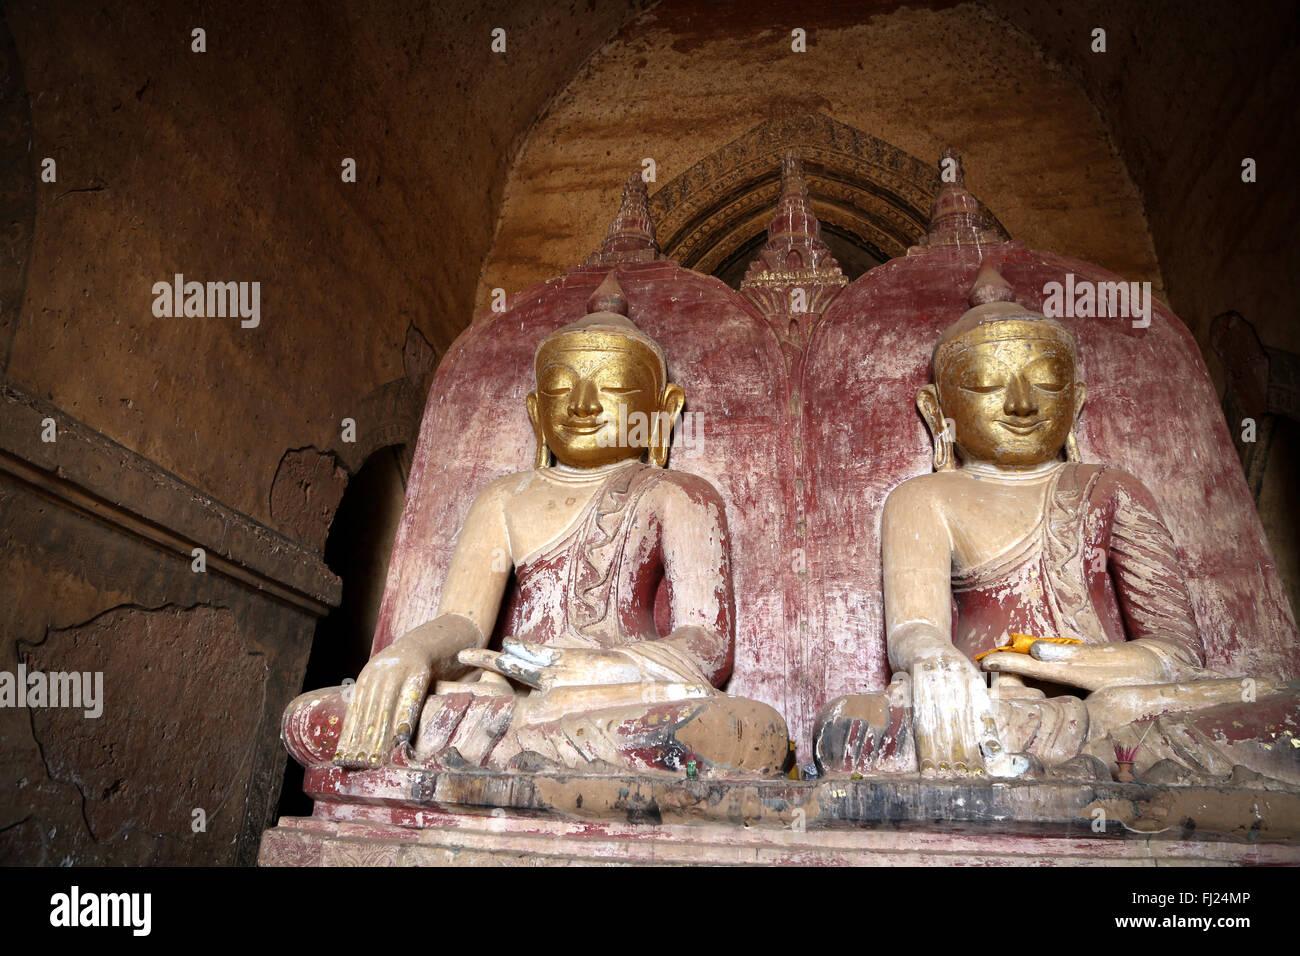 Twin Buddhas of the Dhammayangyi Temple, Bagan, Myanmar - Stock Image